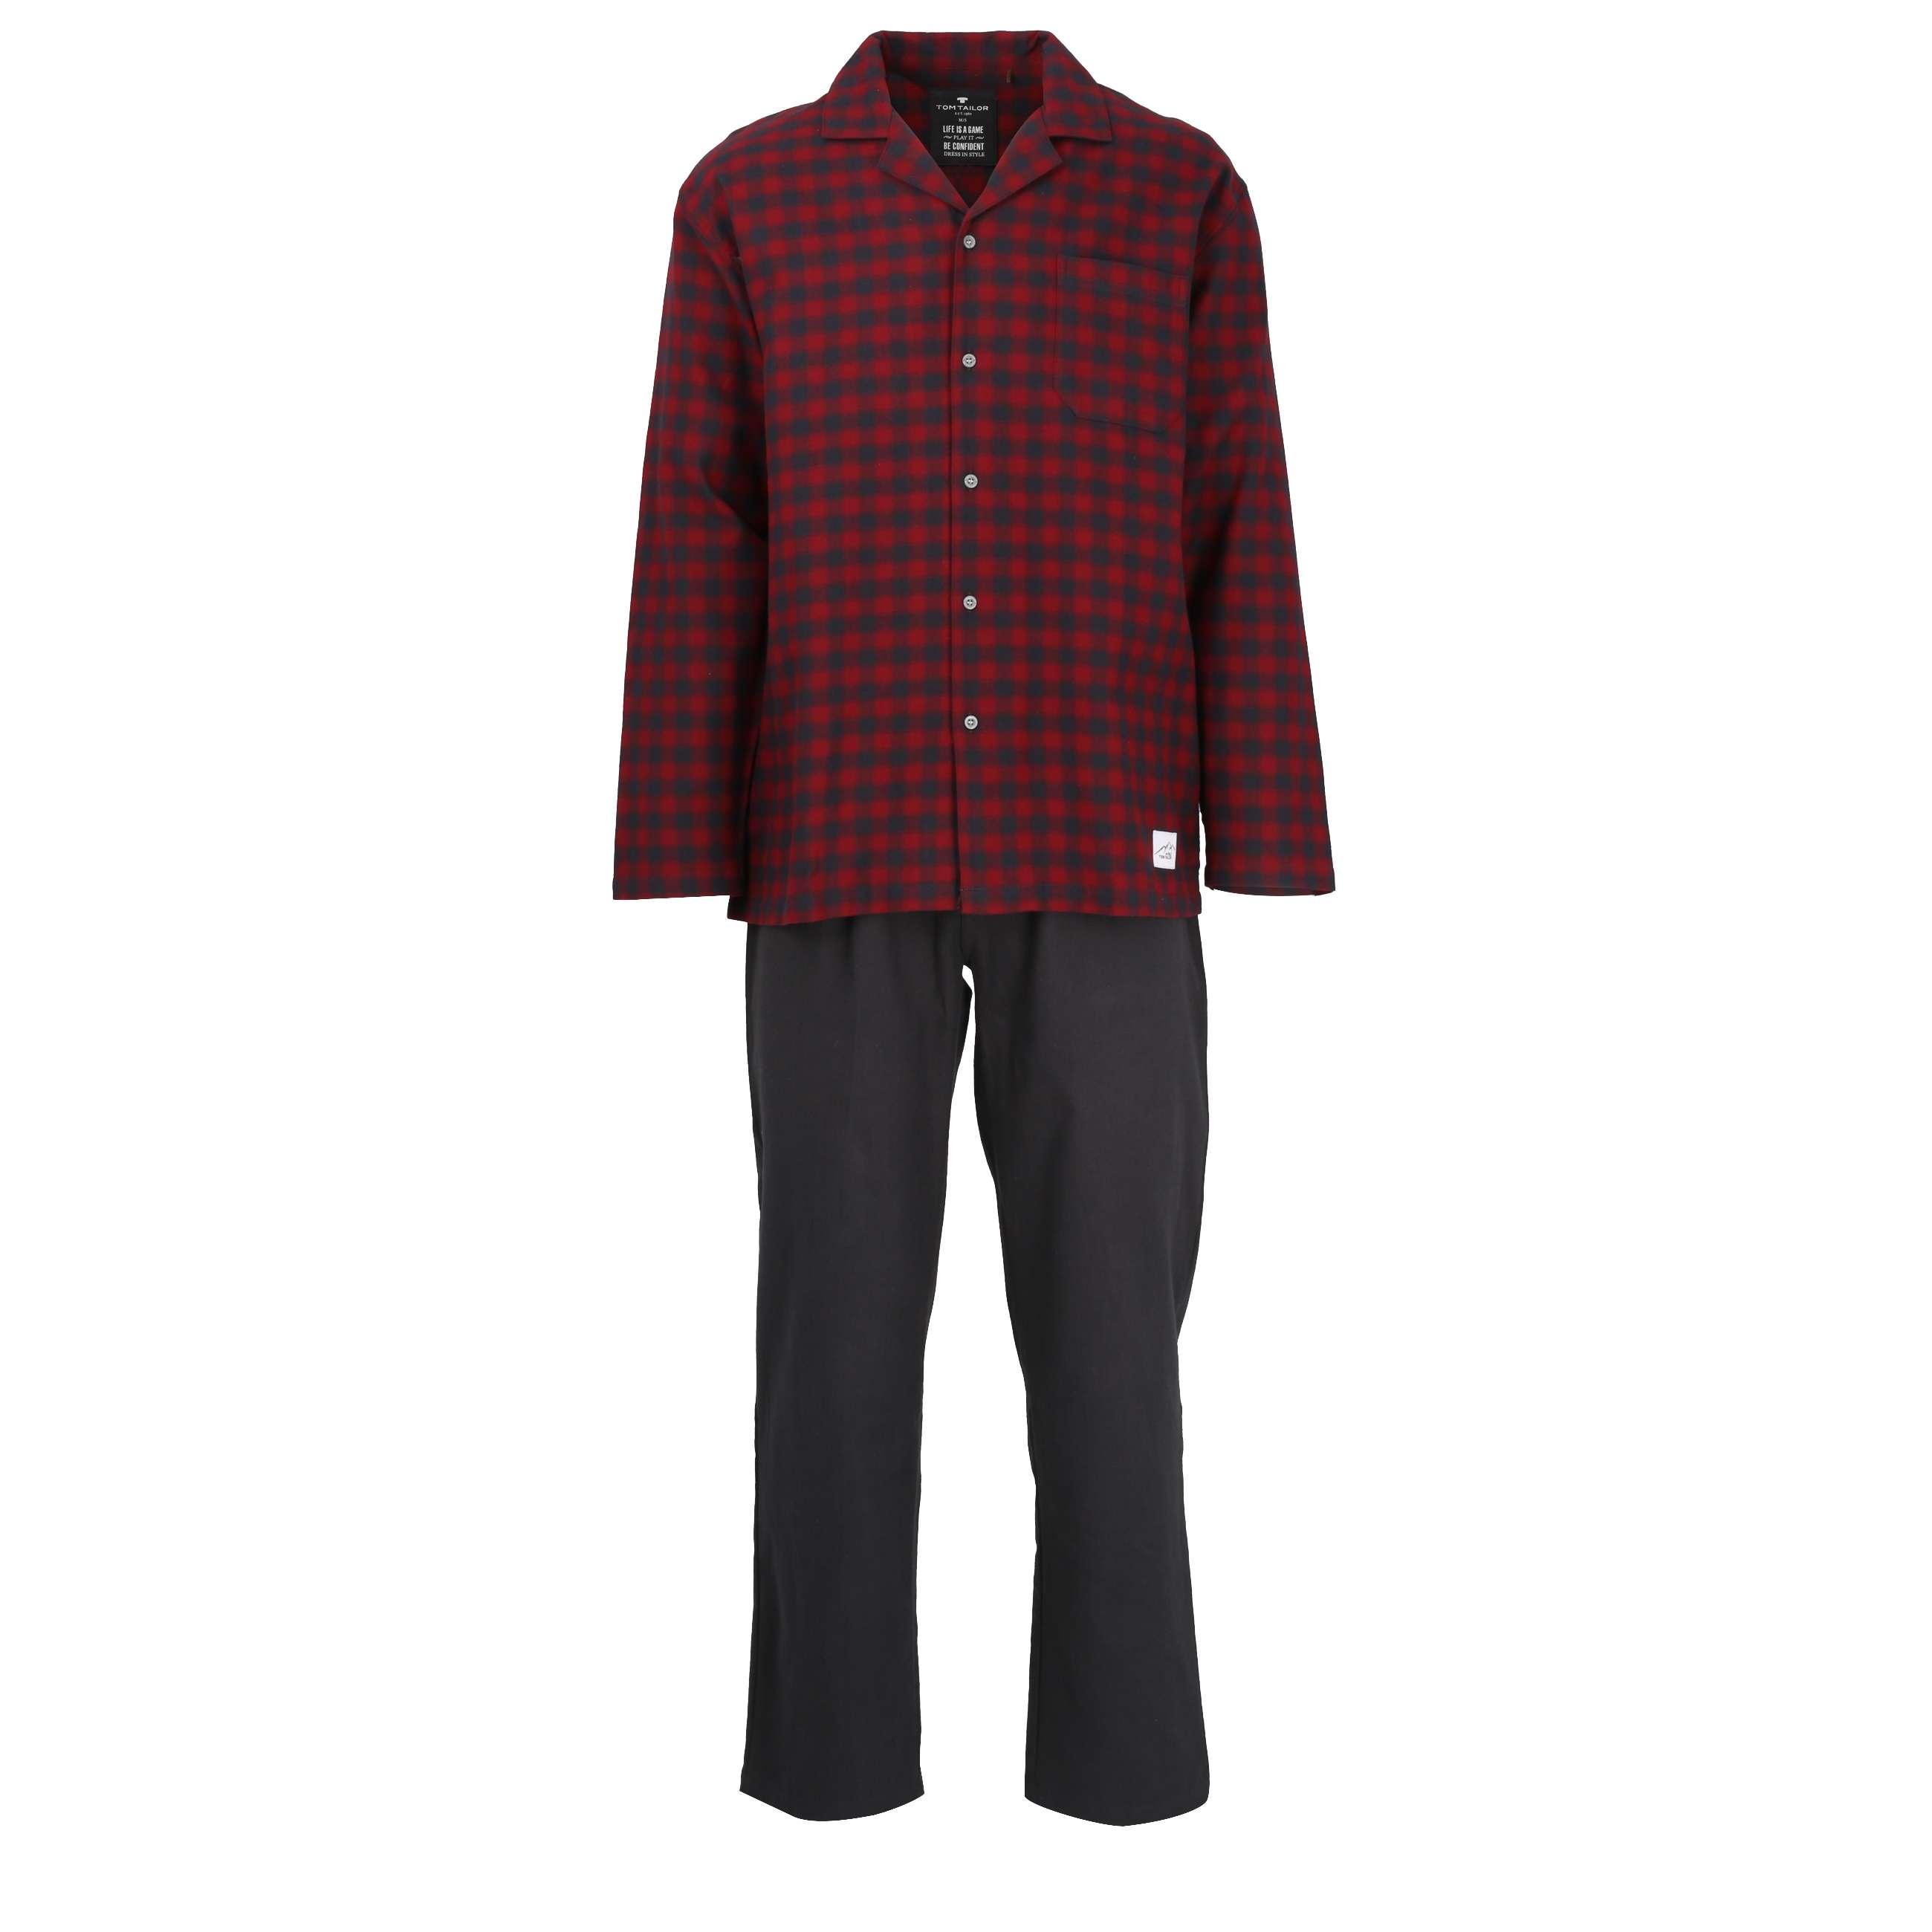 tom tailor herren pyjama schlafanzug rot kariert. Black Bedroom Furniture Sets. Home Design Ideas